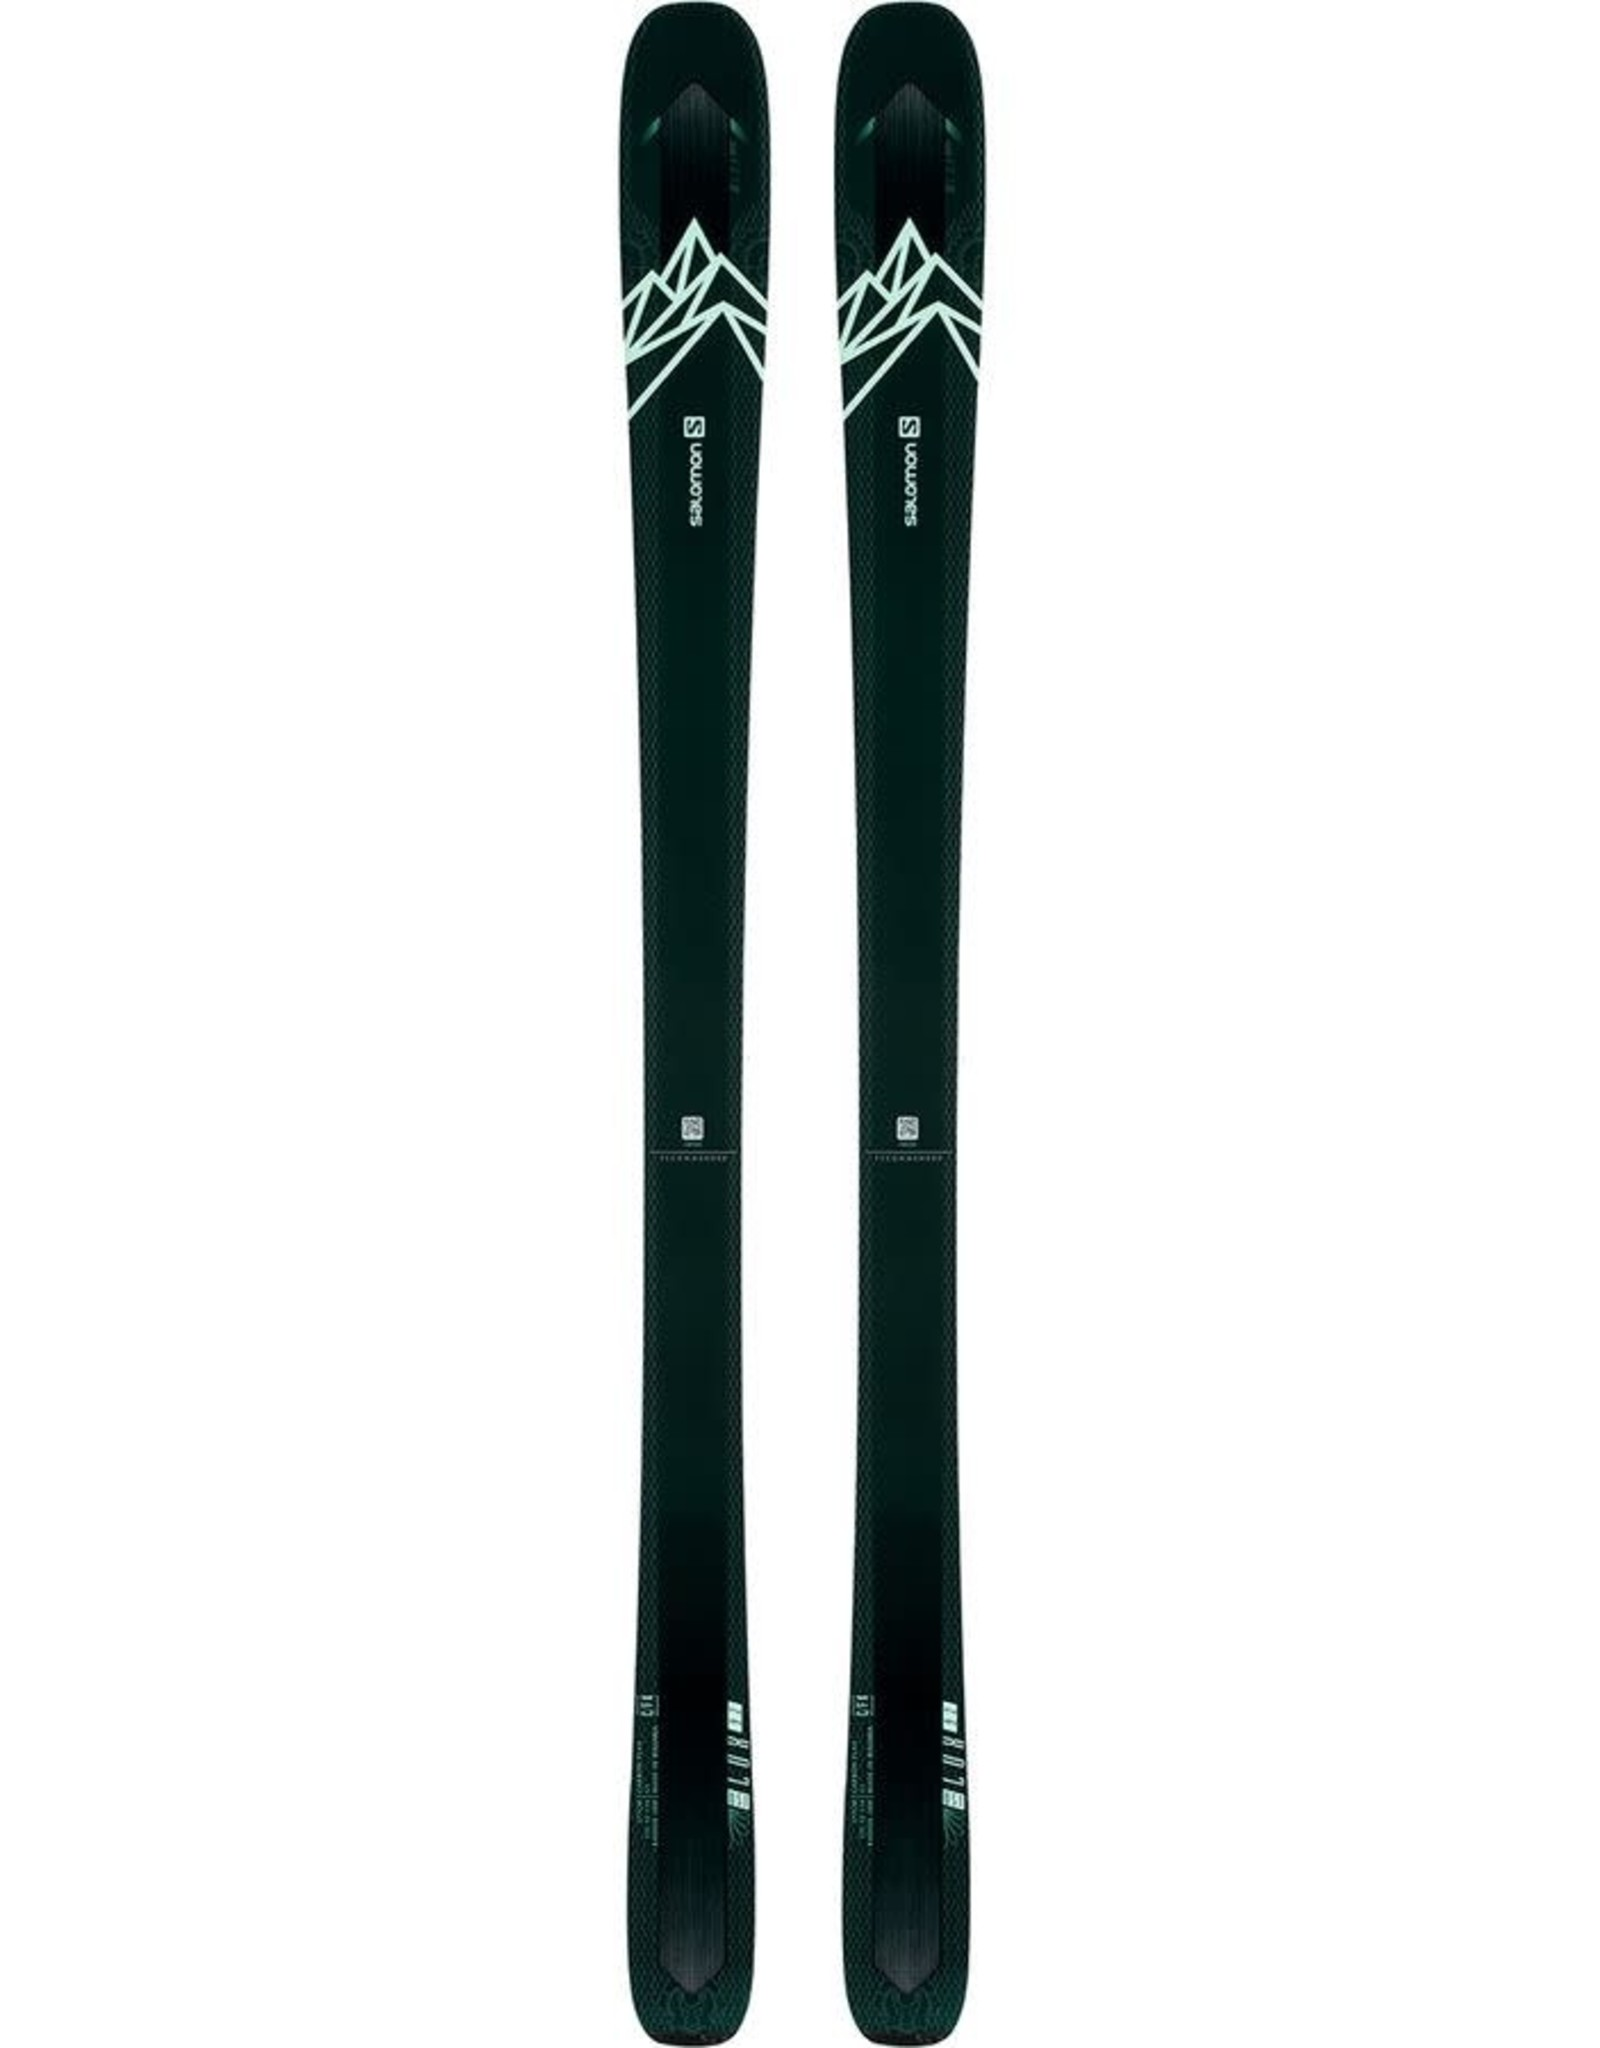 Salomon SALOMON Skis QST LUX 92 (20/21)